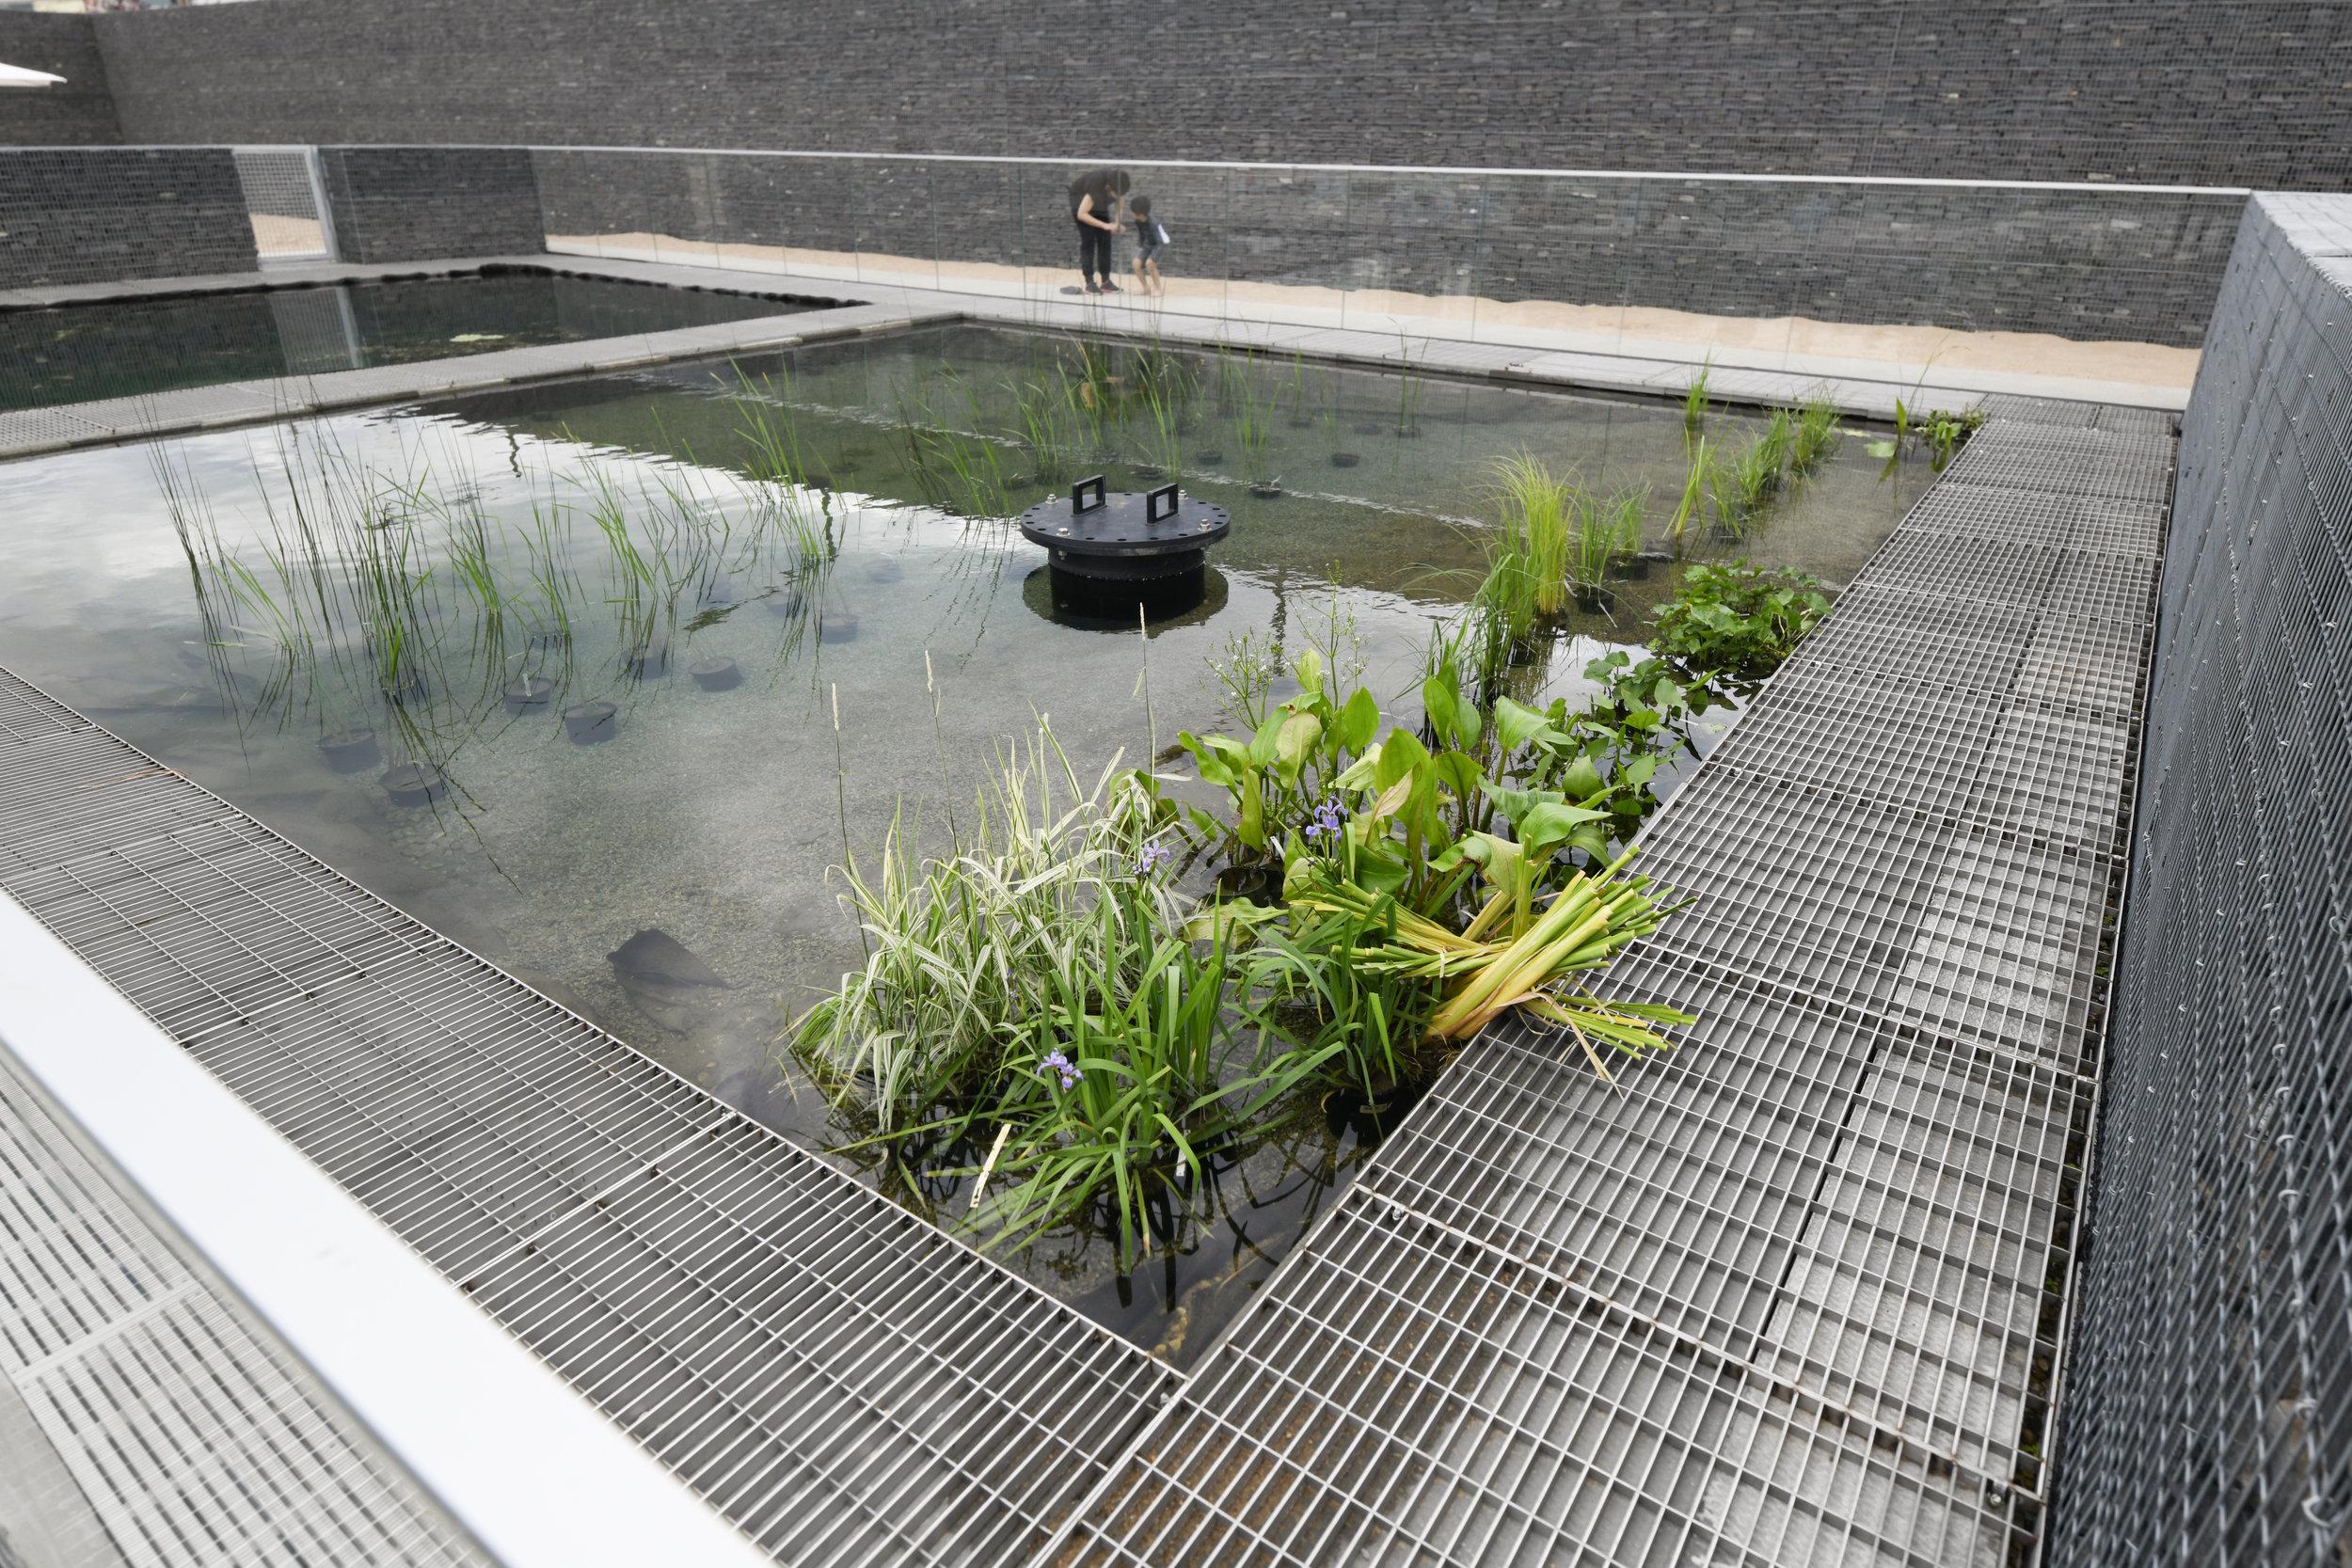 gh3 - Borden Park Natural Swimming Pool - Hydrobotanic Pond